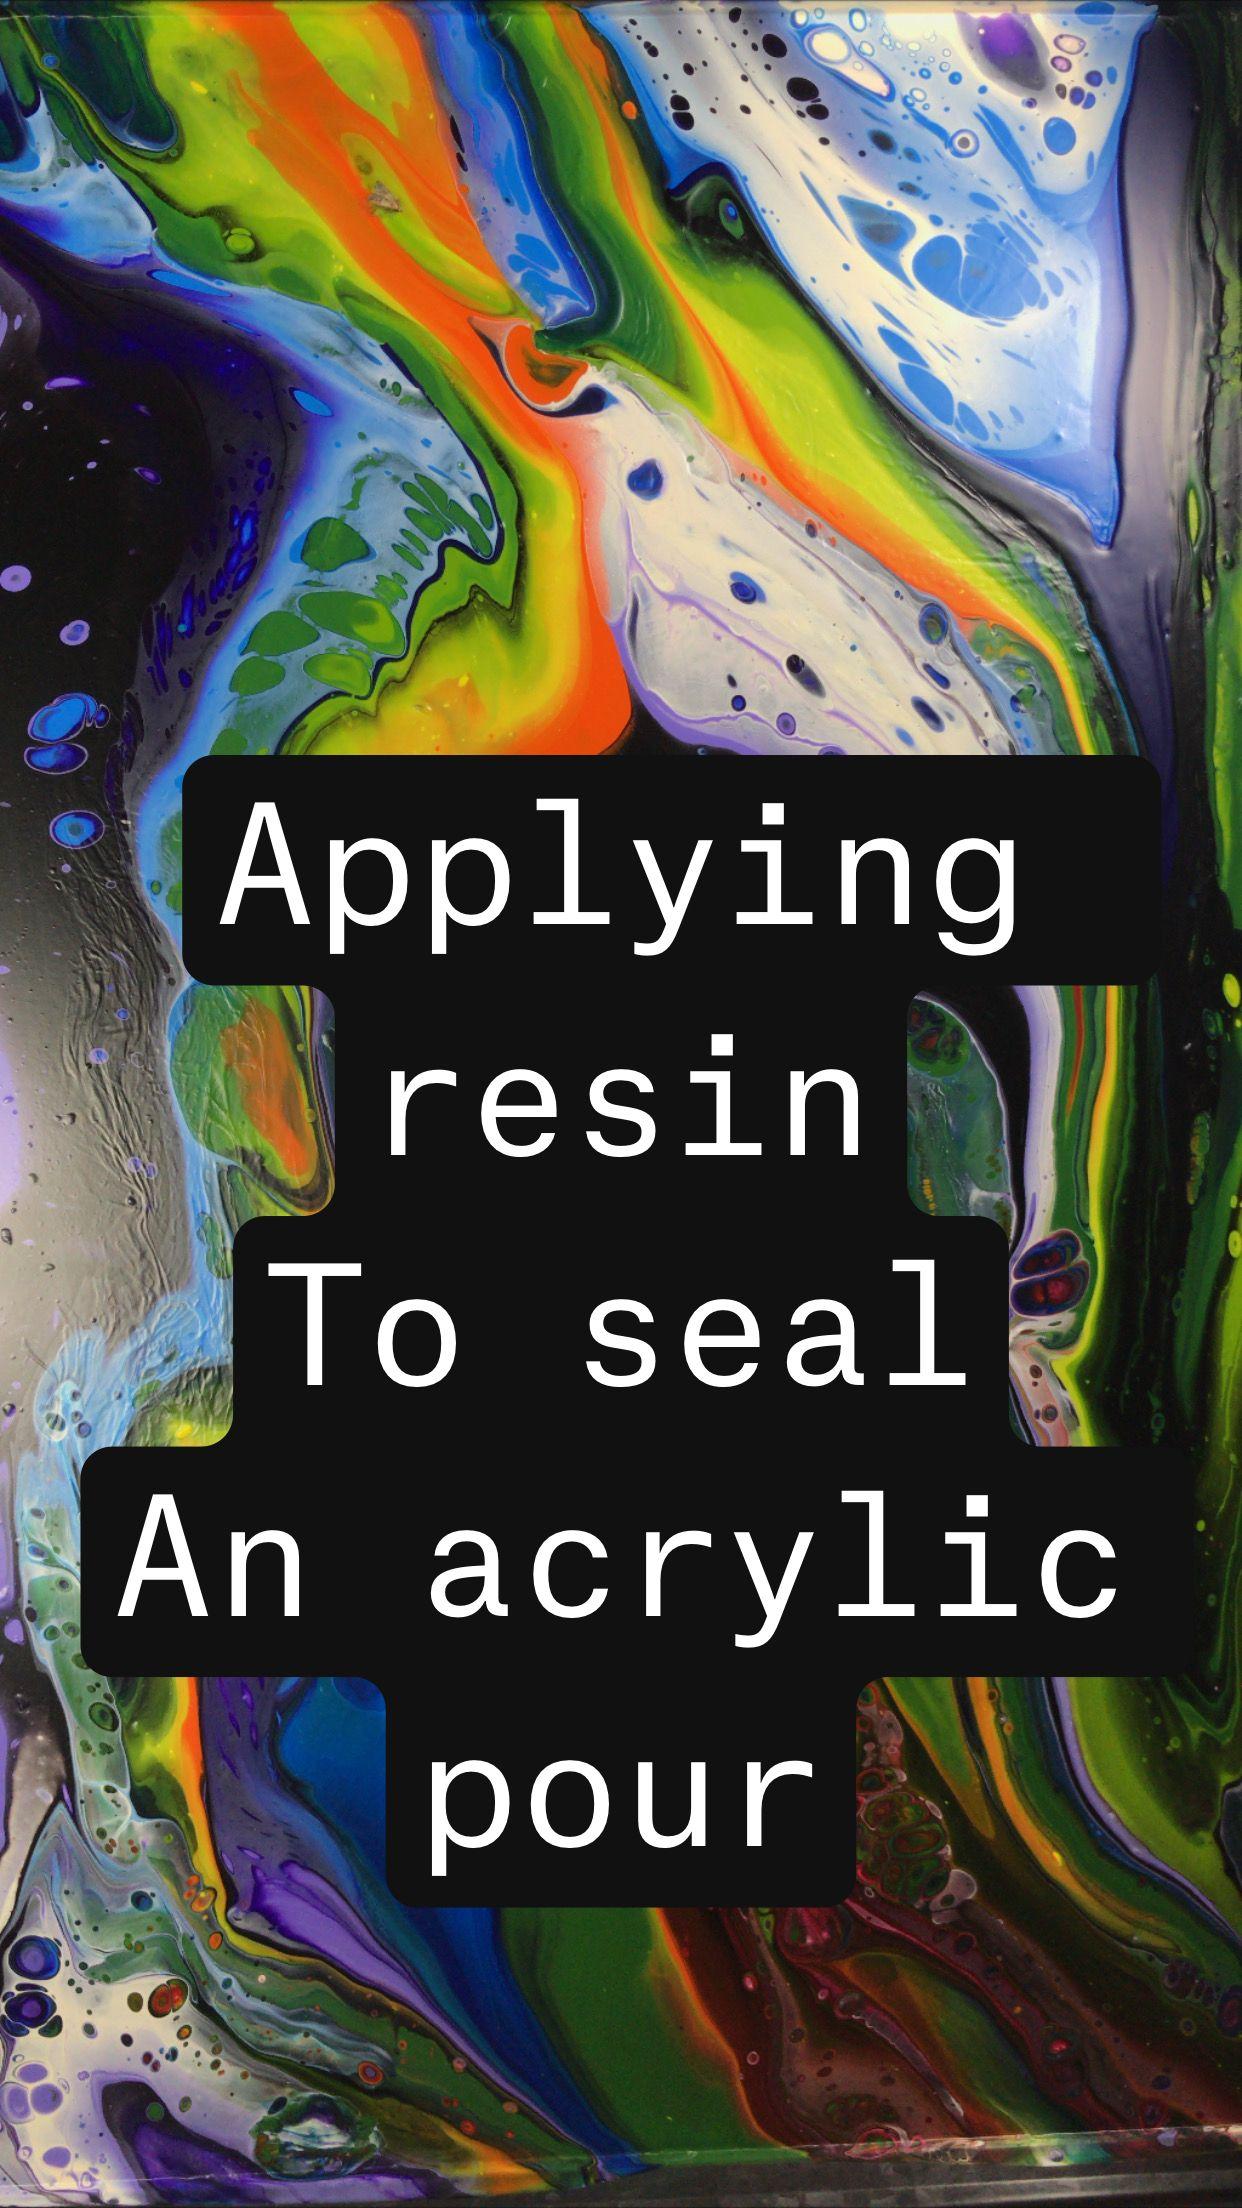 Applying resin To seal An acrylic pour